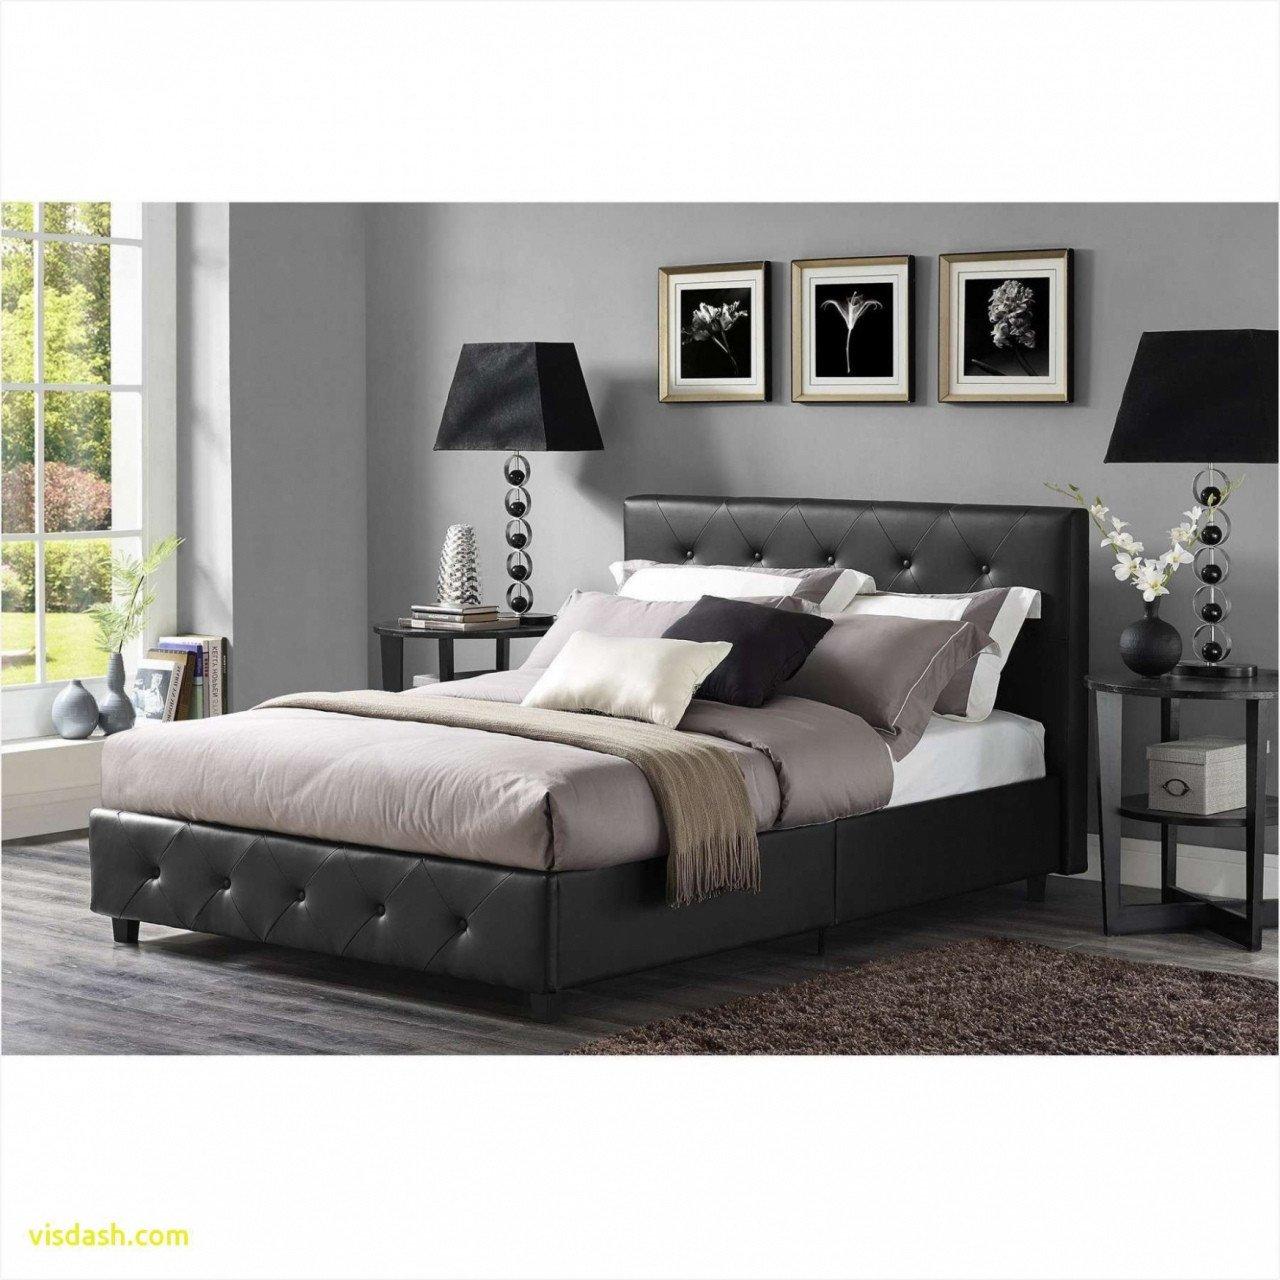 Gray King Bedroom Set Unique Tufted Bedroom Set Gray King Bedroom Sets — Rabbssteak